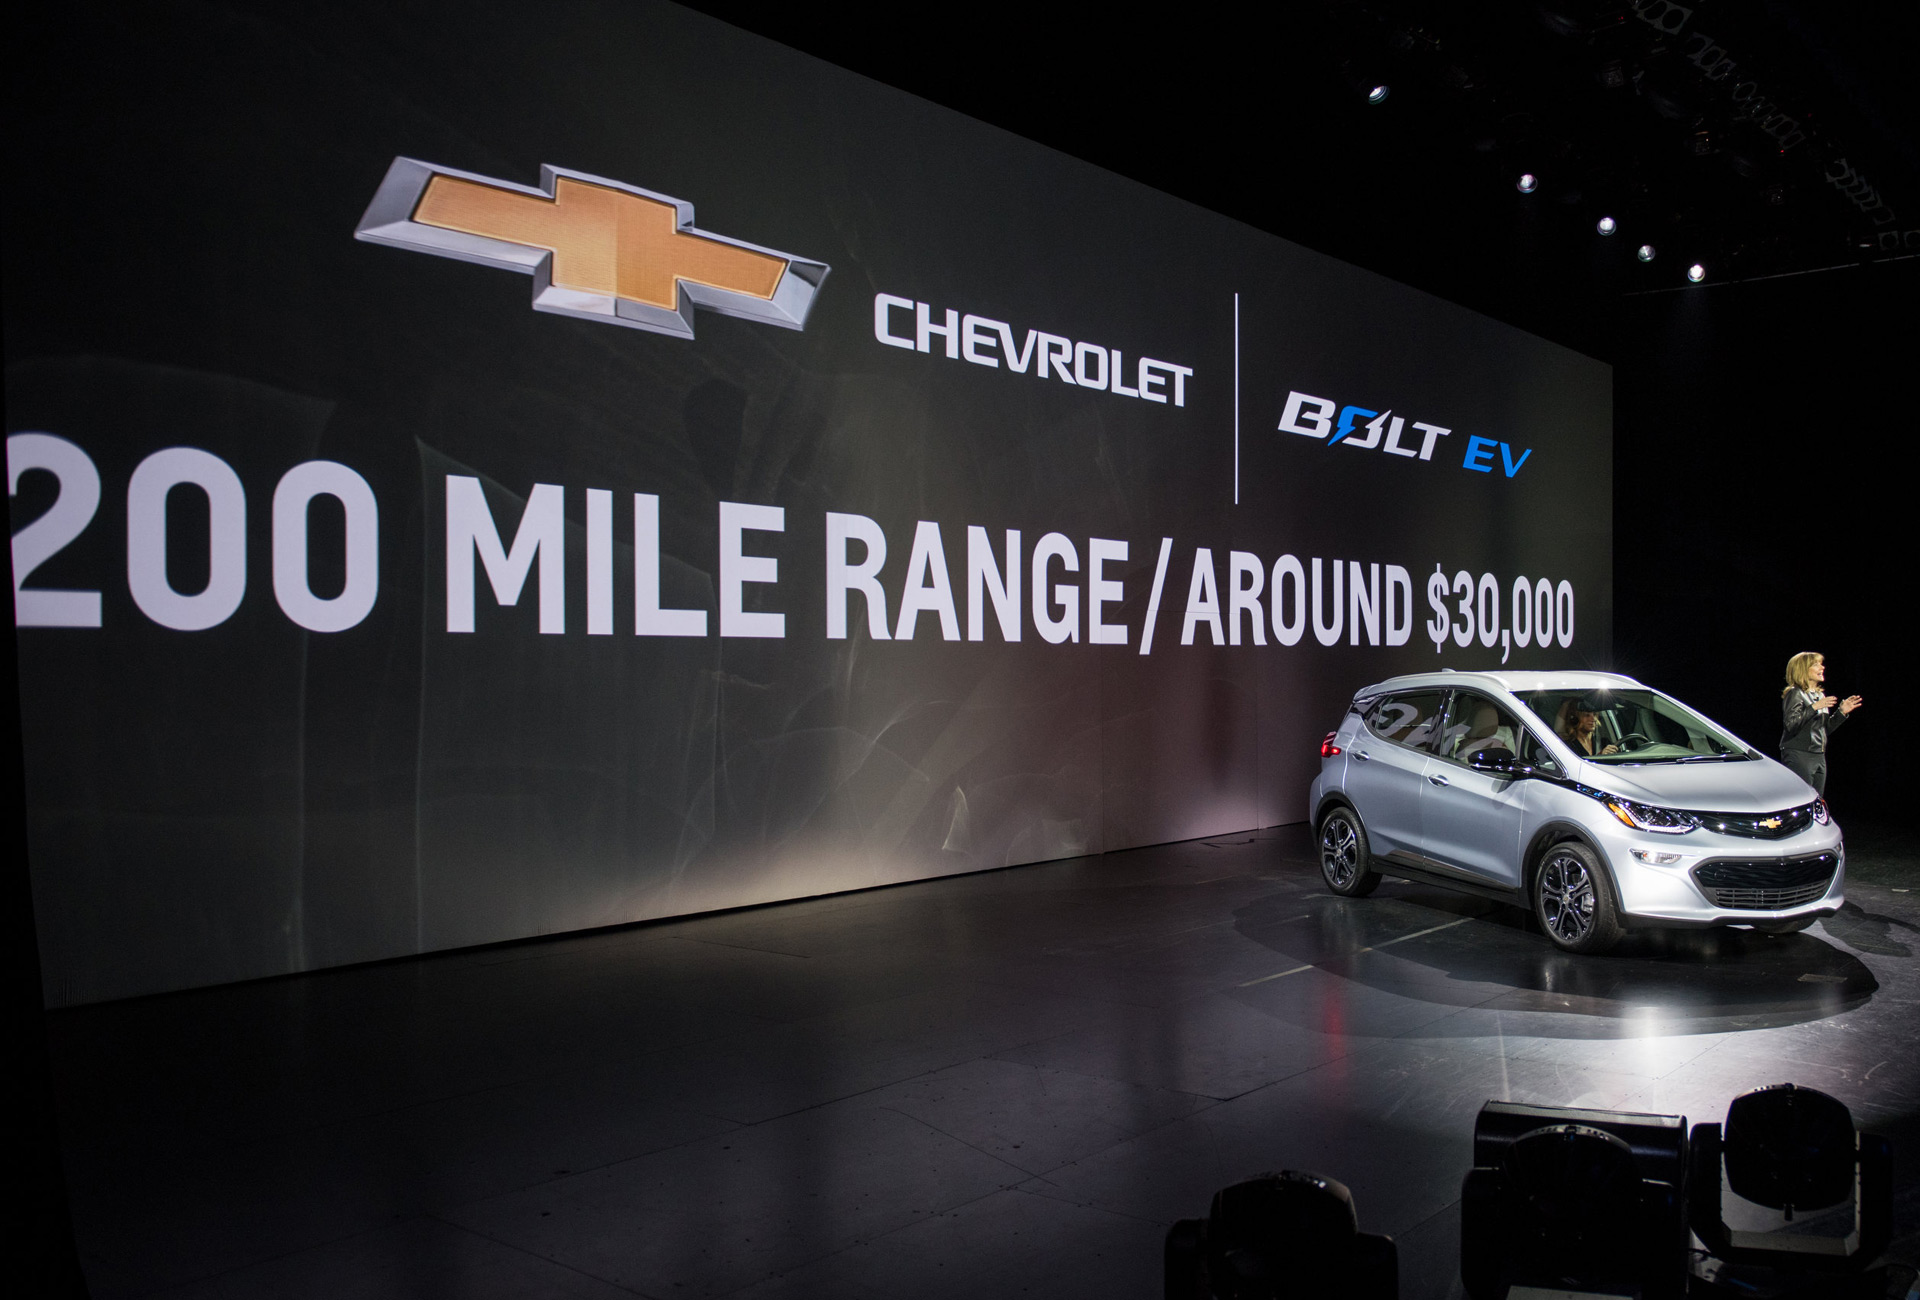 2017 Chevy Bolt Ev Electric Car 238 Mile Epa Range Rating 119 Mpge Combined